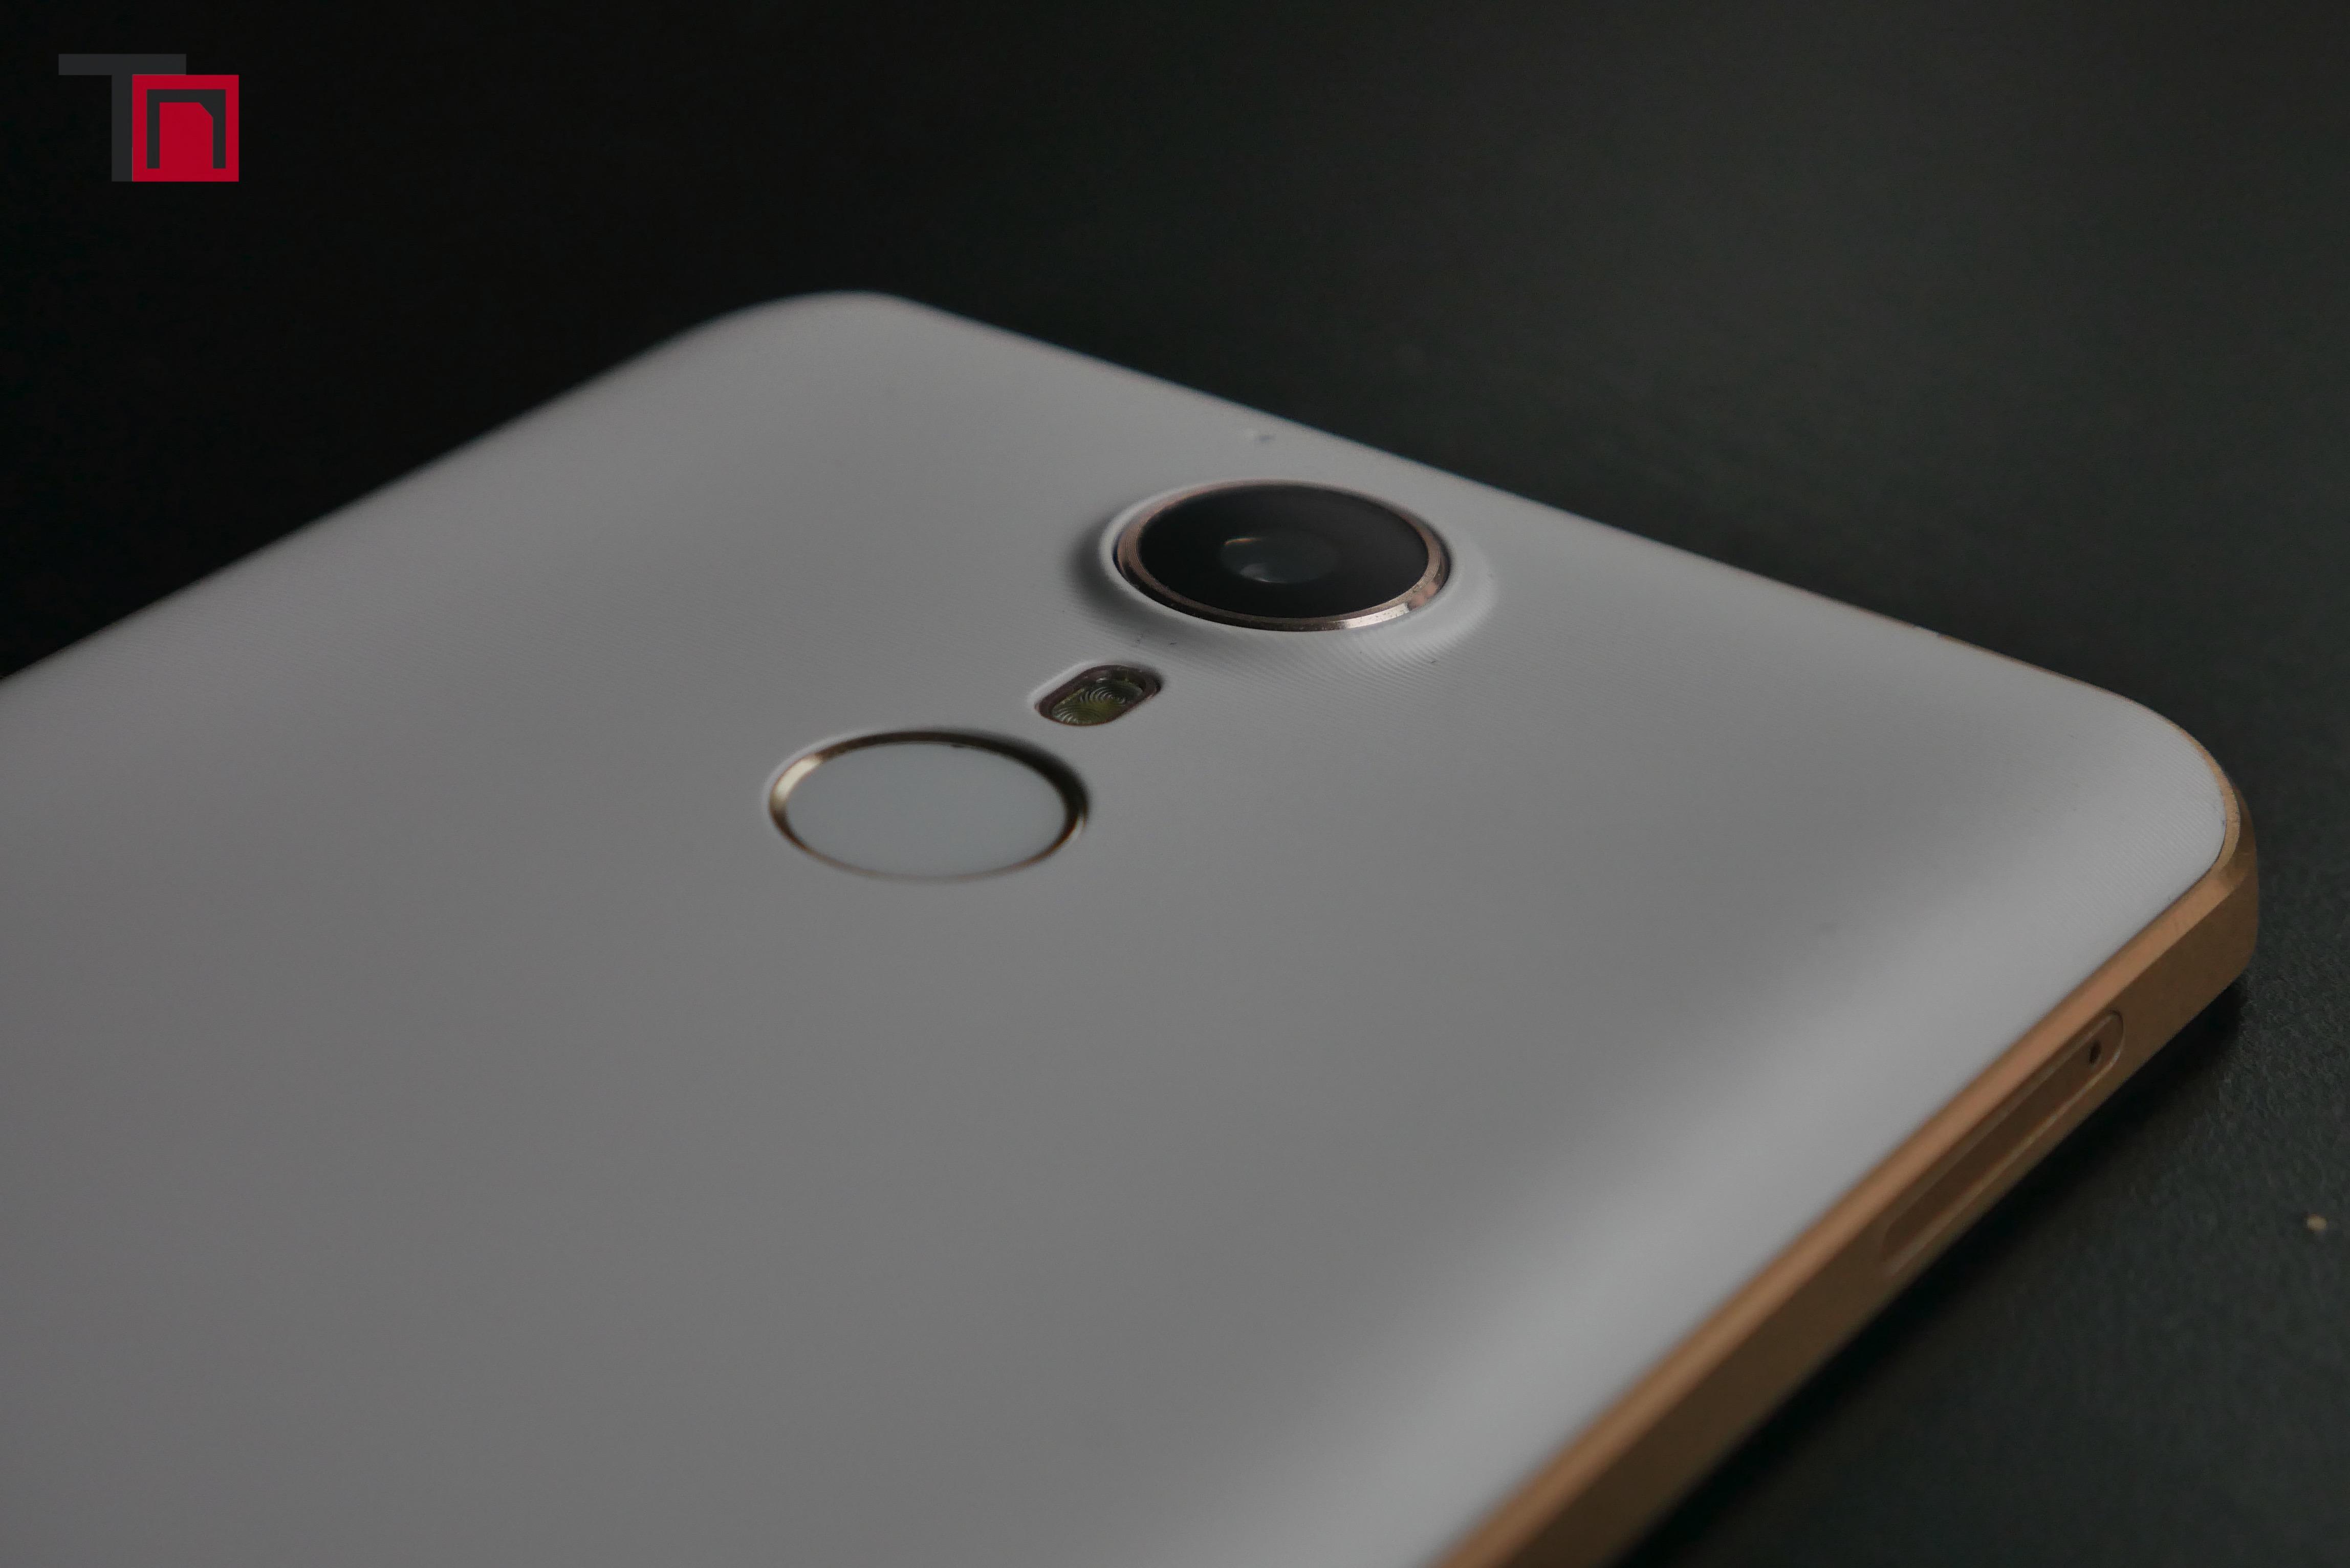 Doogee F7 pro – Que vaut ce smartphone chinois 10 coeurs ?